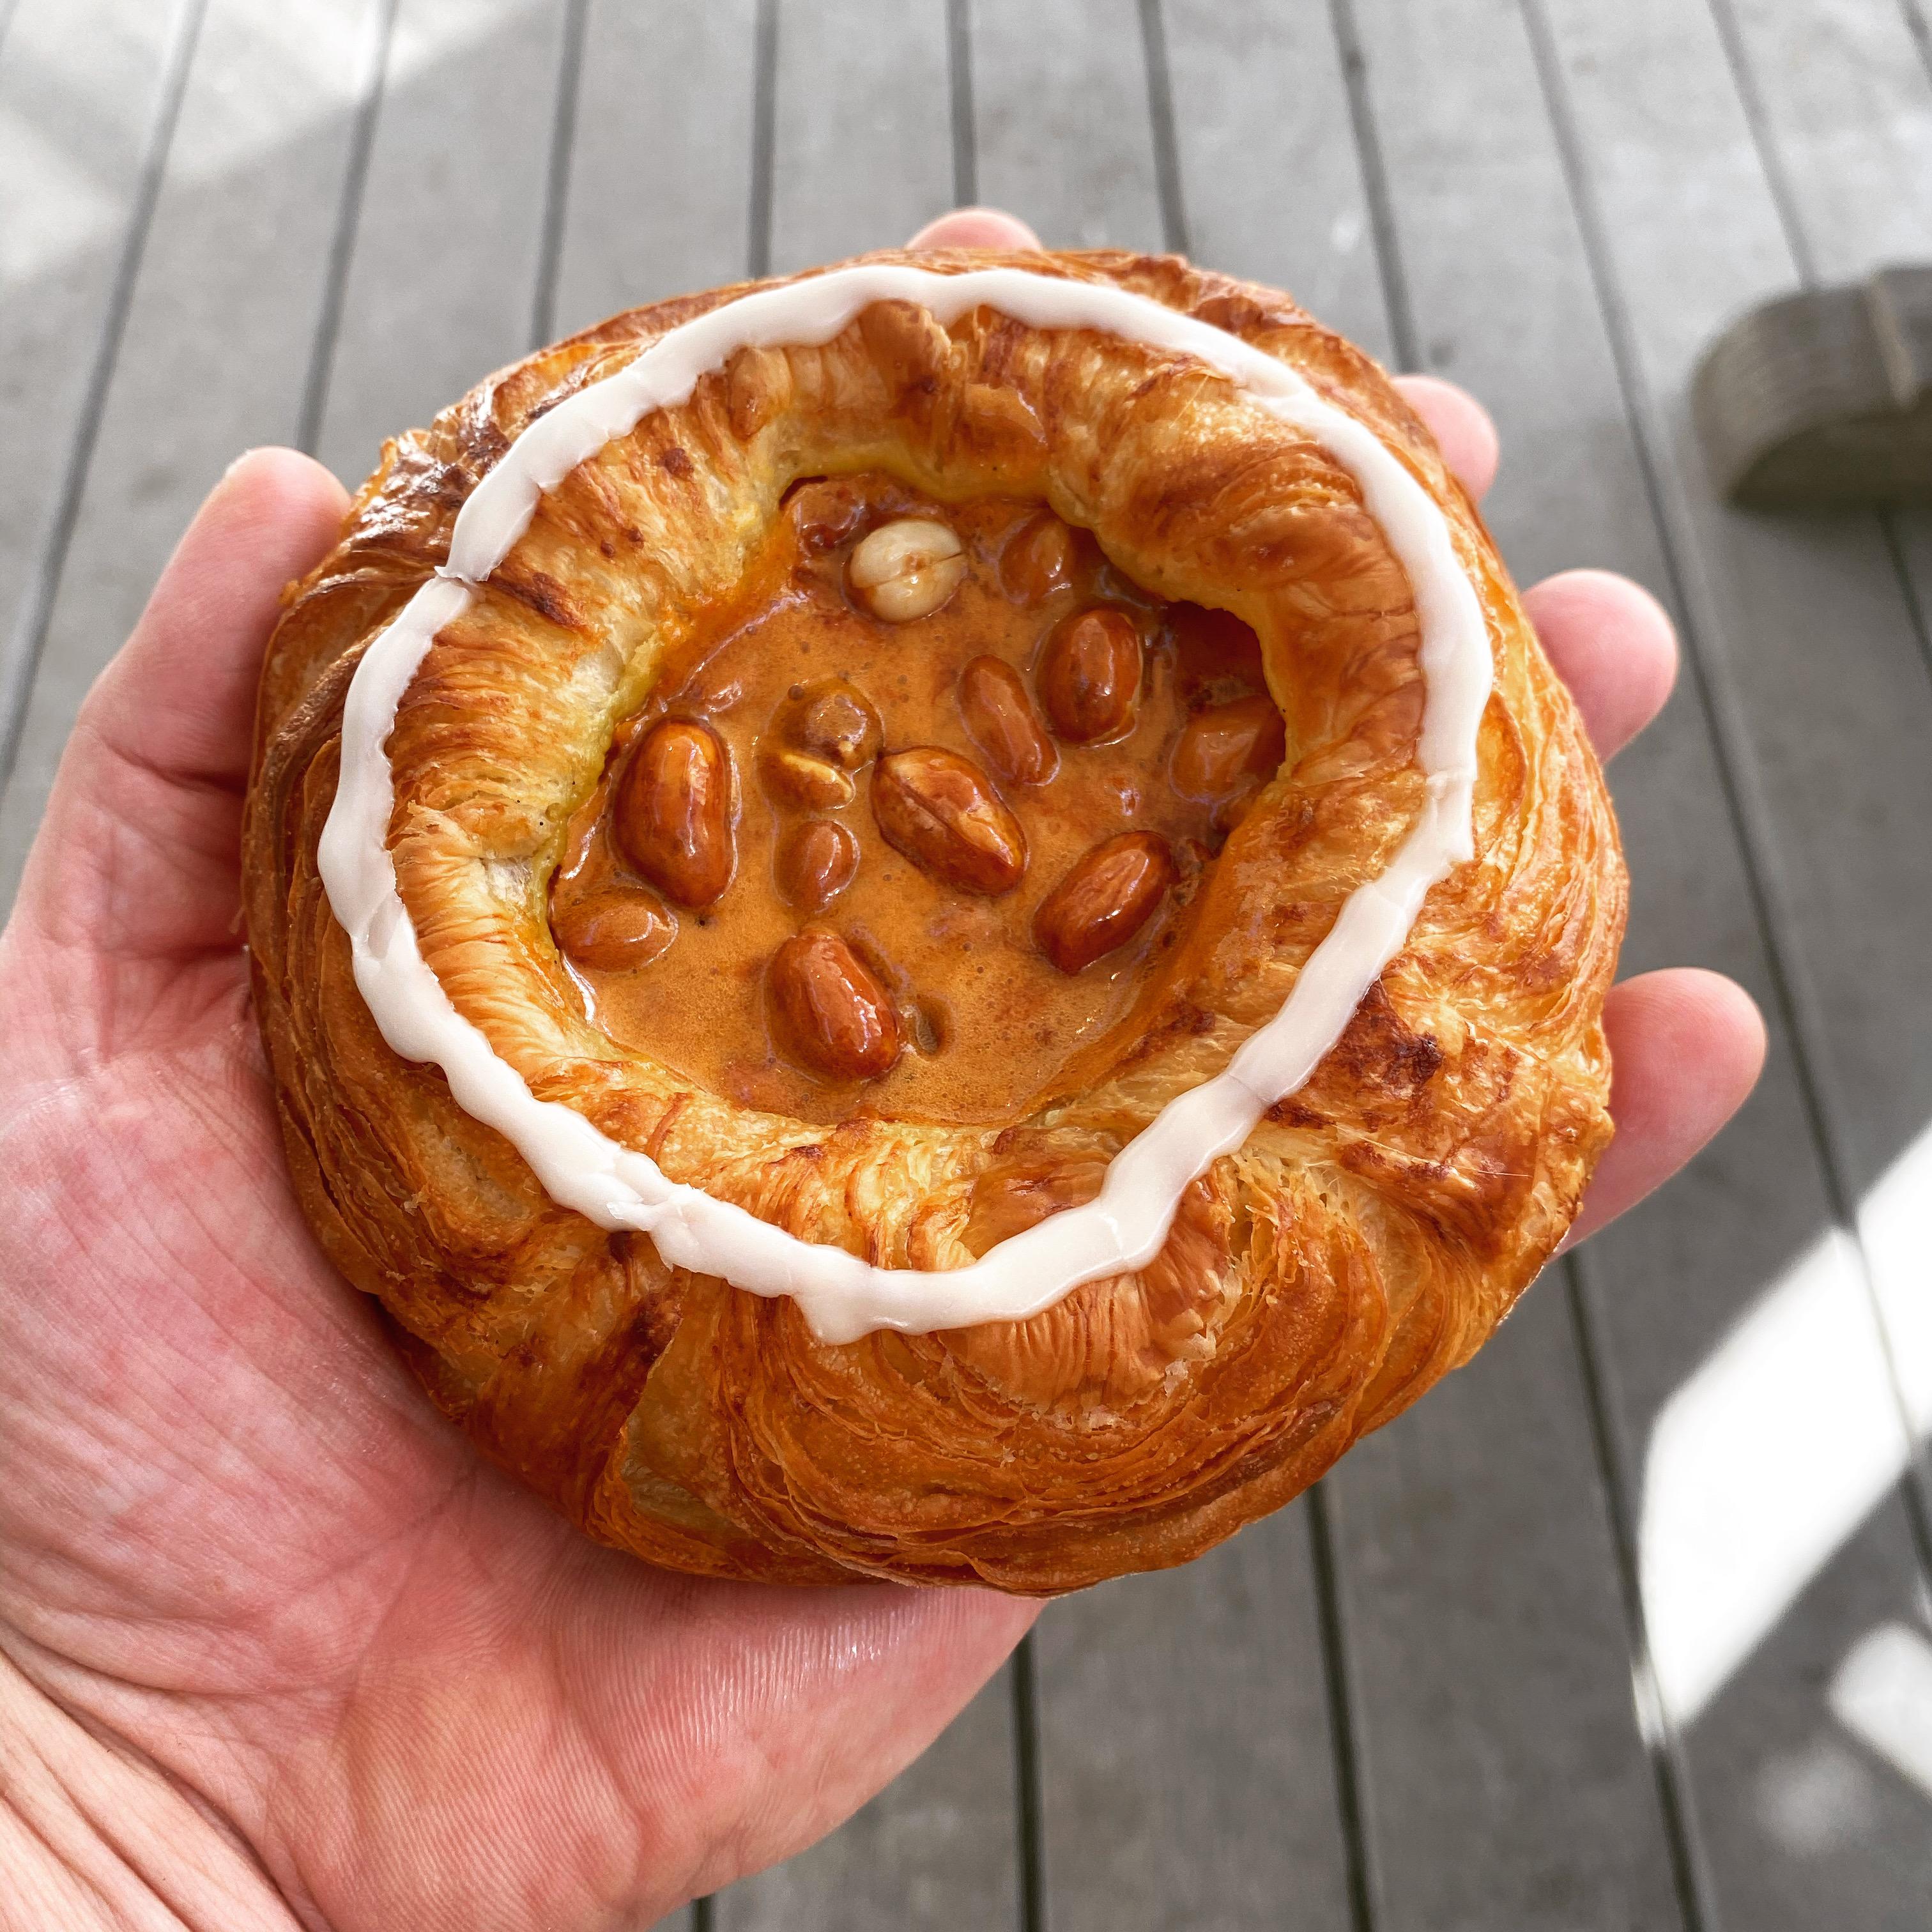 A Danish made with vanilla cream, peanut brittle, and a Dr Pepper glaze.